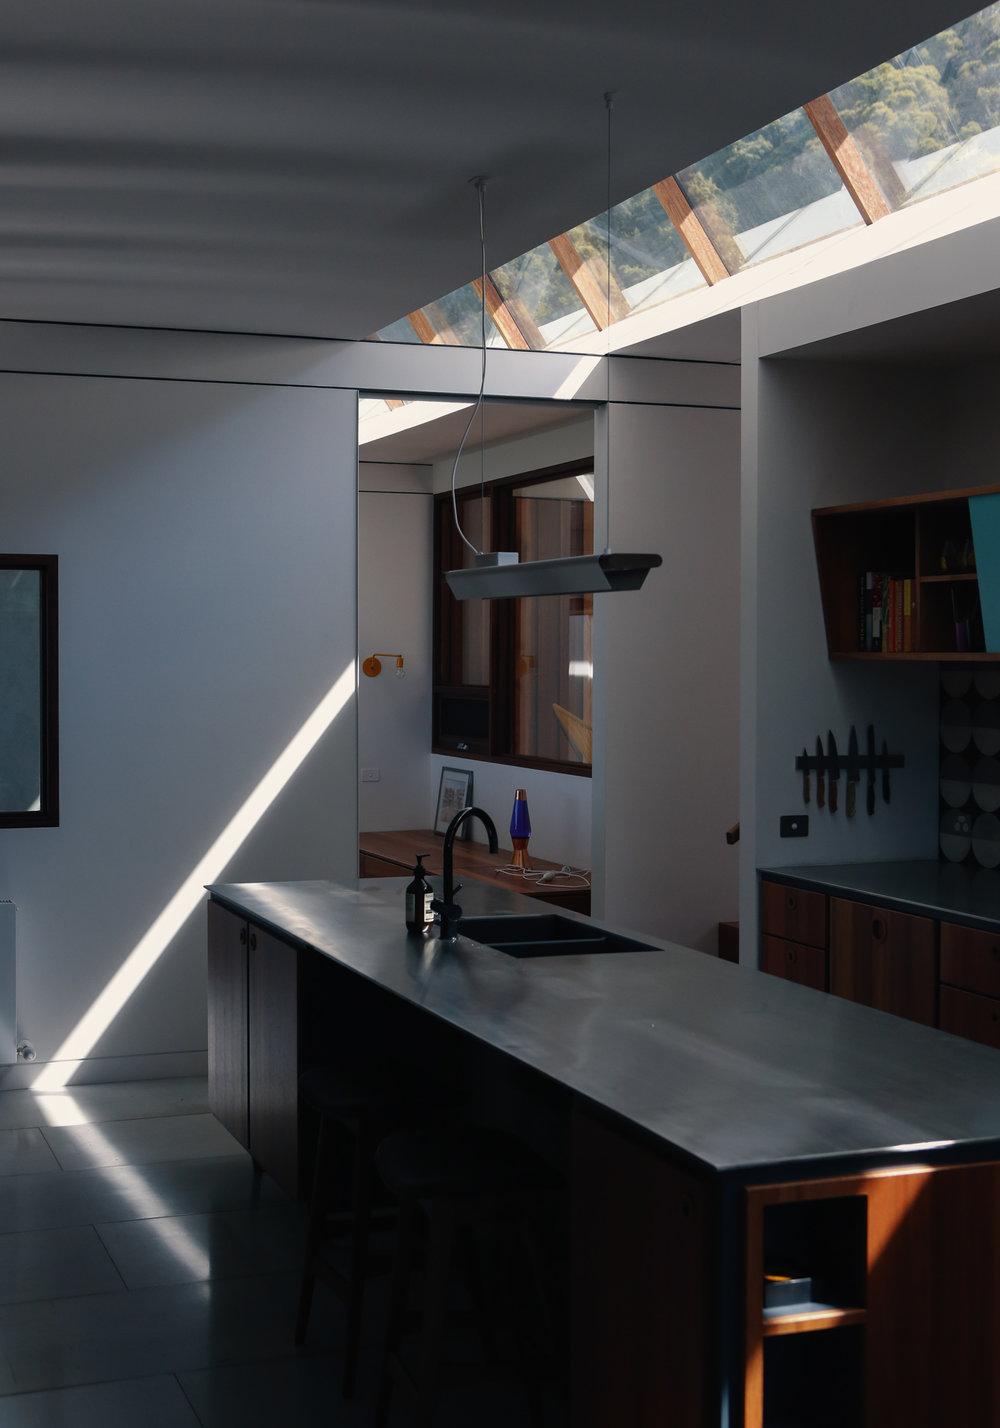 Takt Robertson Yarrawa interior kitchen.jpg